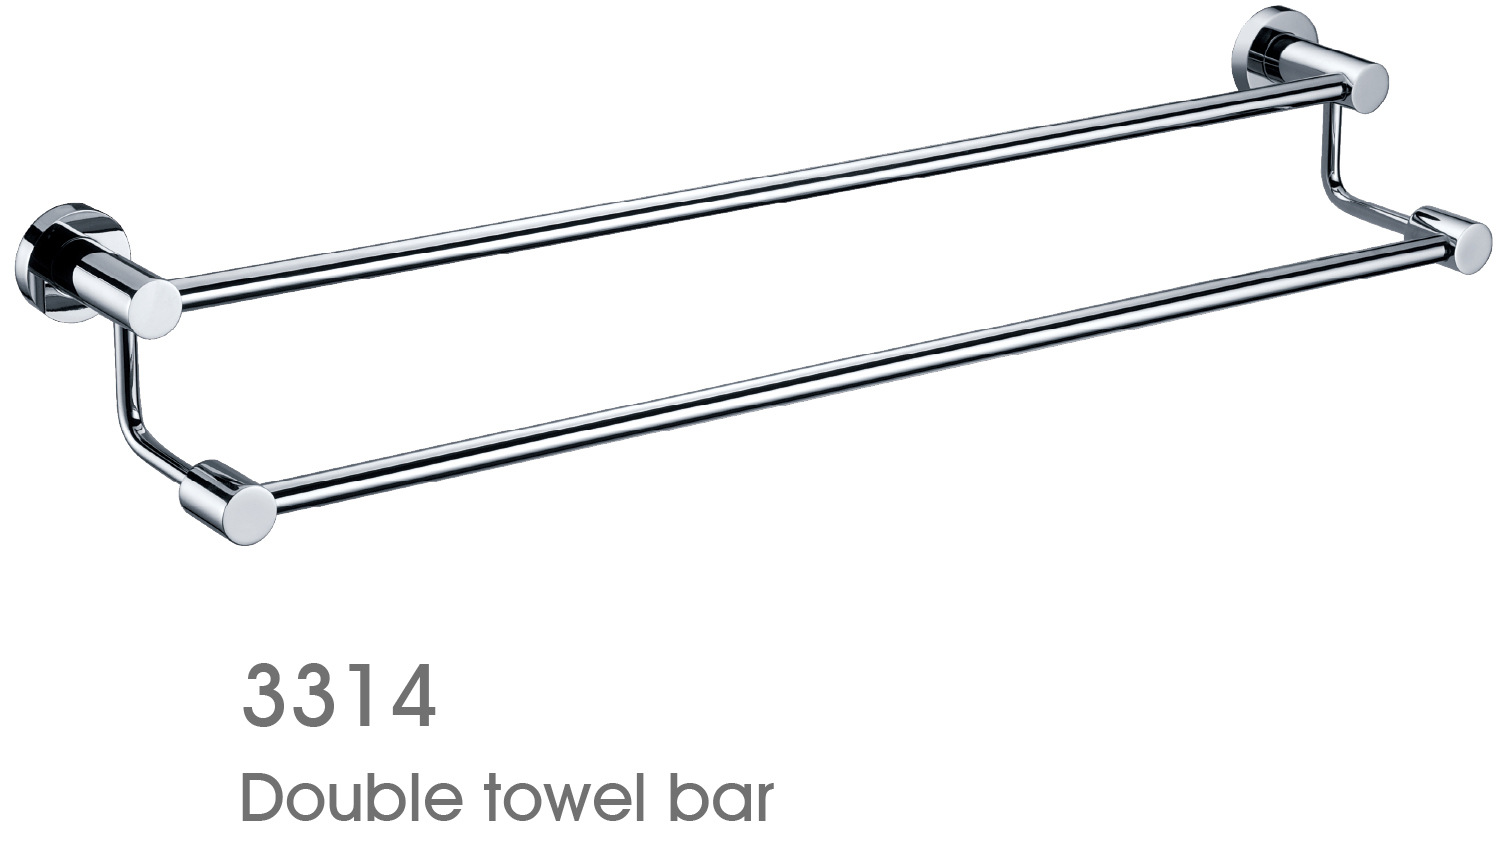 Solid Brass Bathroom Accessories Towel Bar